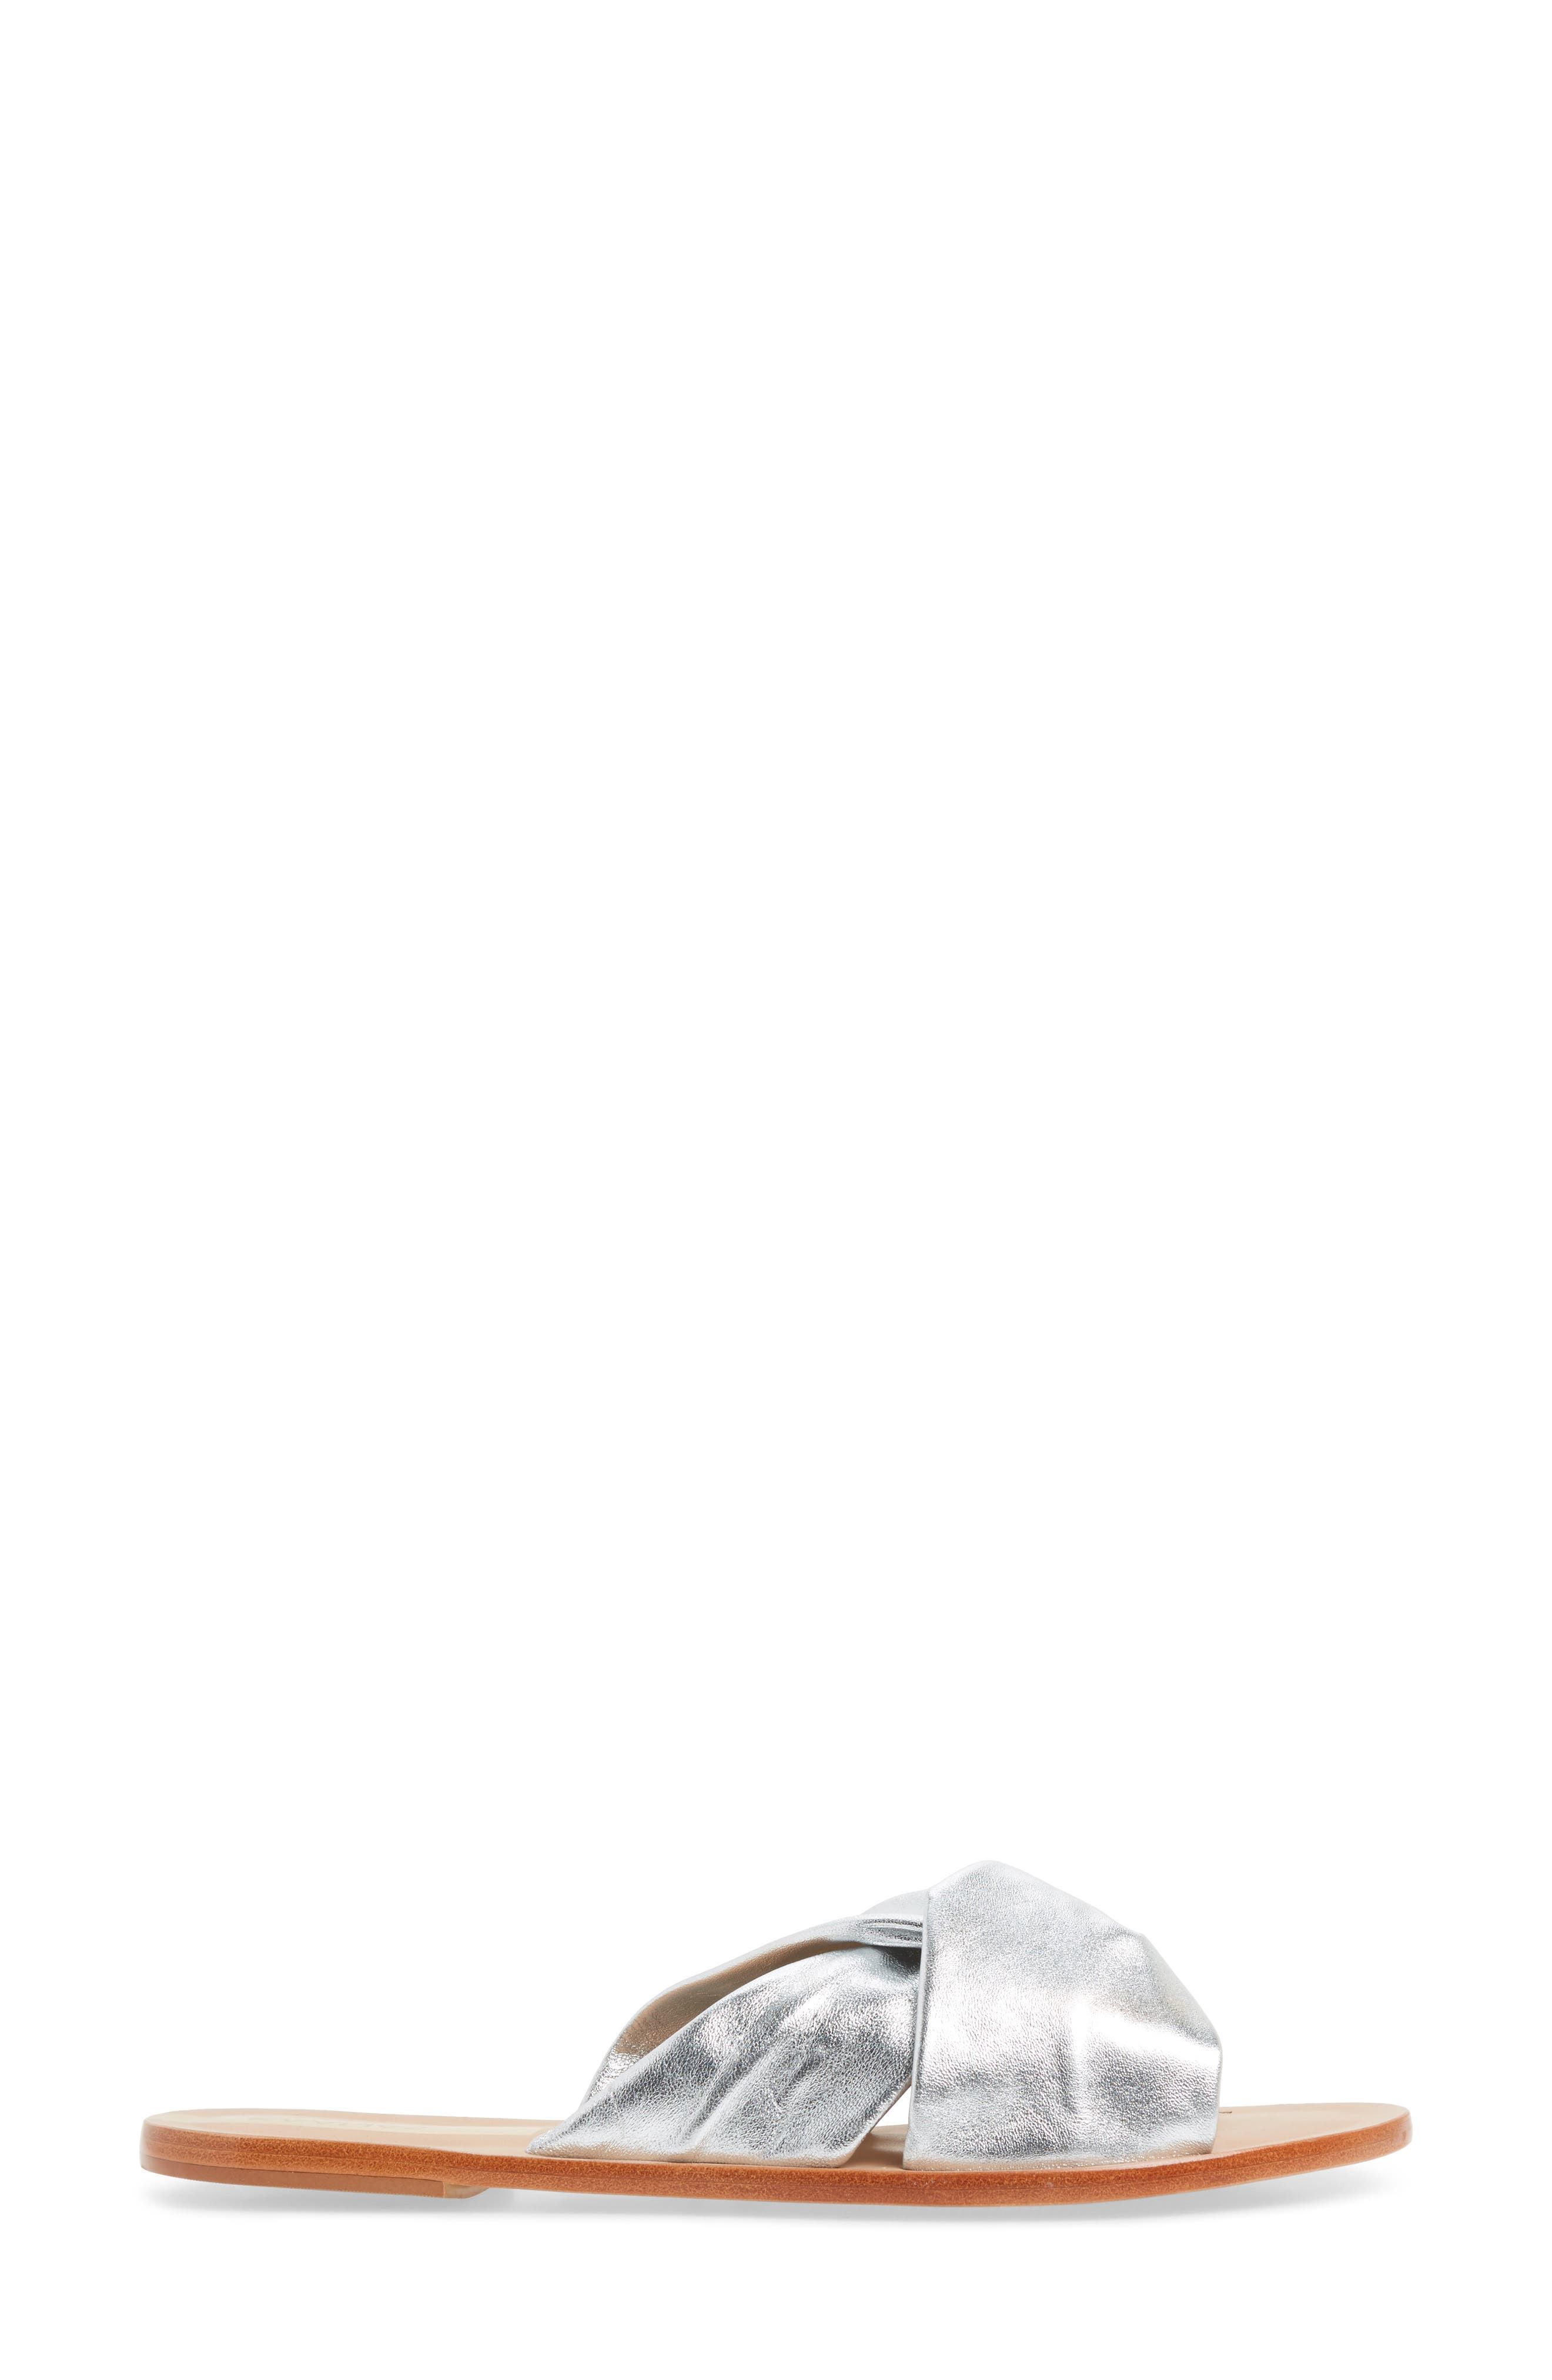 Belem Looped Slide Sandal,                             Alternate thumbnail 3, color,                             040